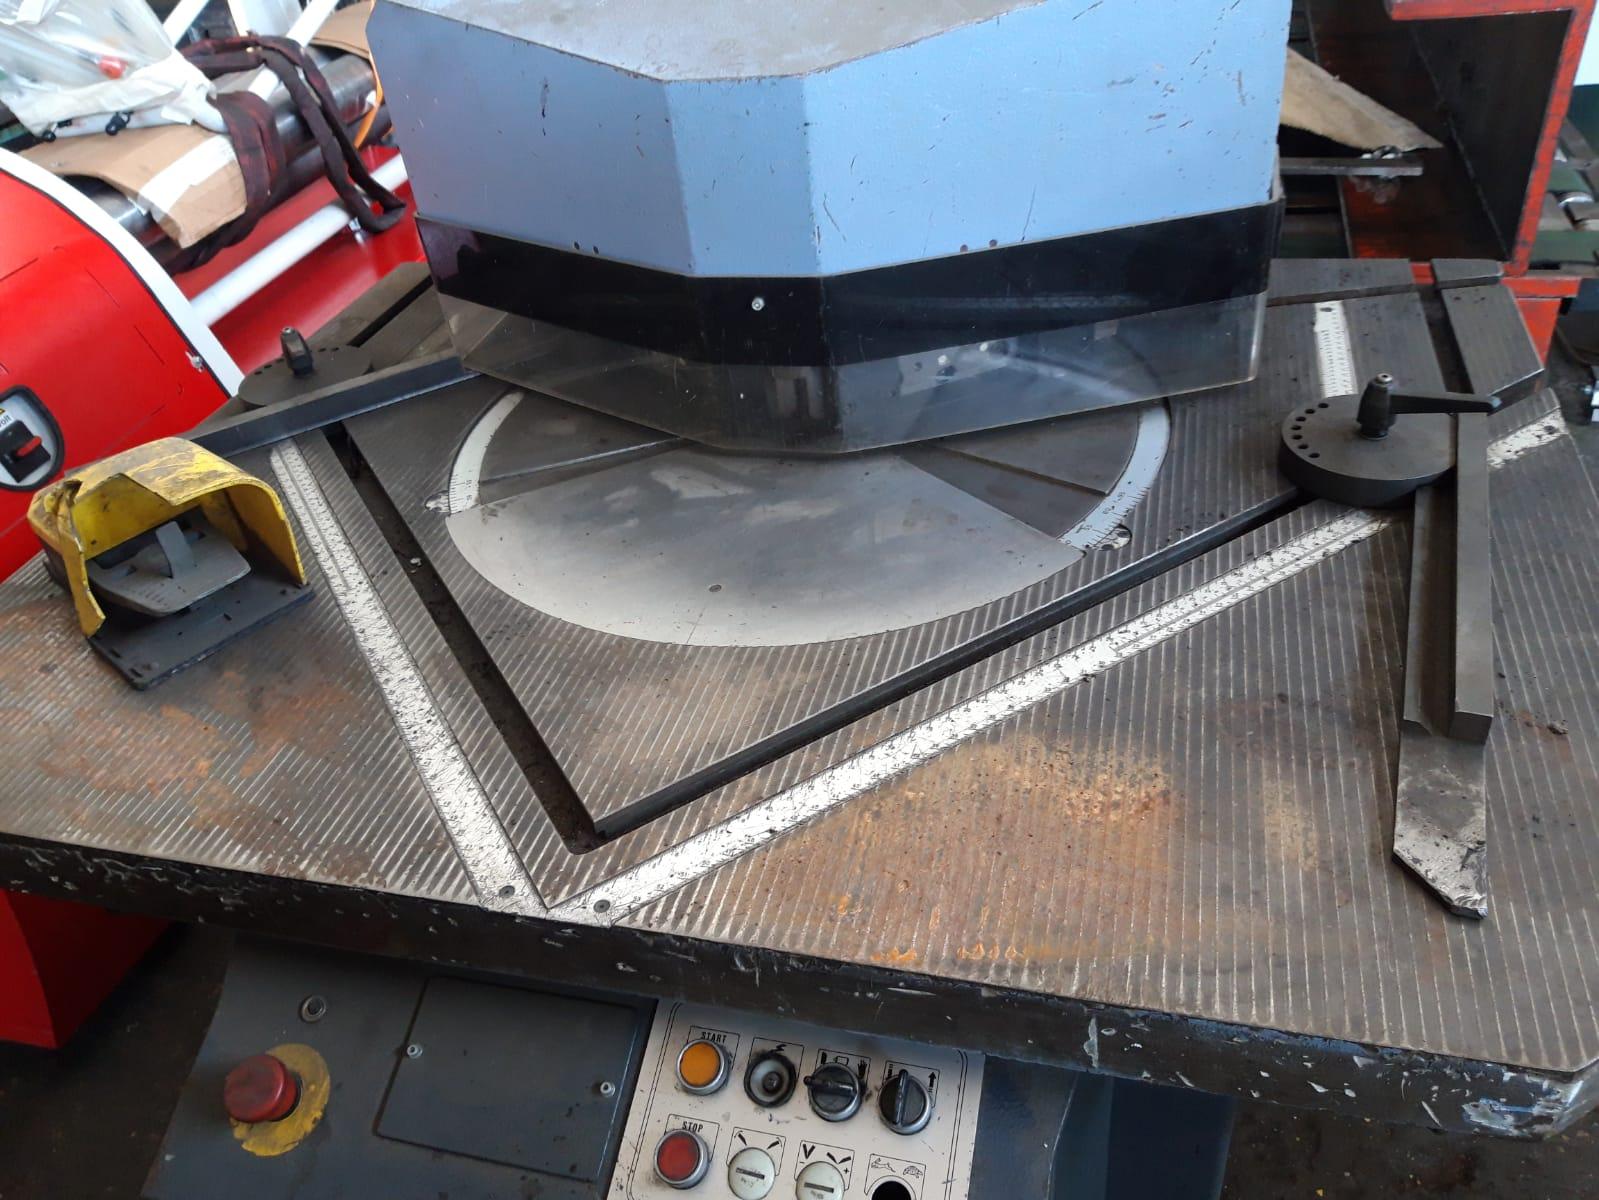 Scantonatrice idraulica Comaca var 250 in vendita - foto 5